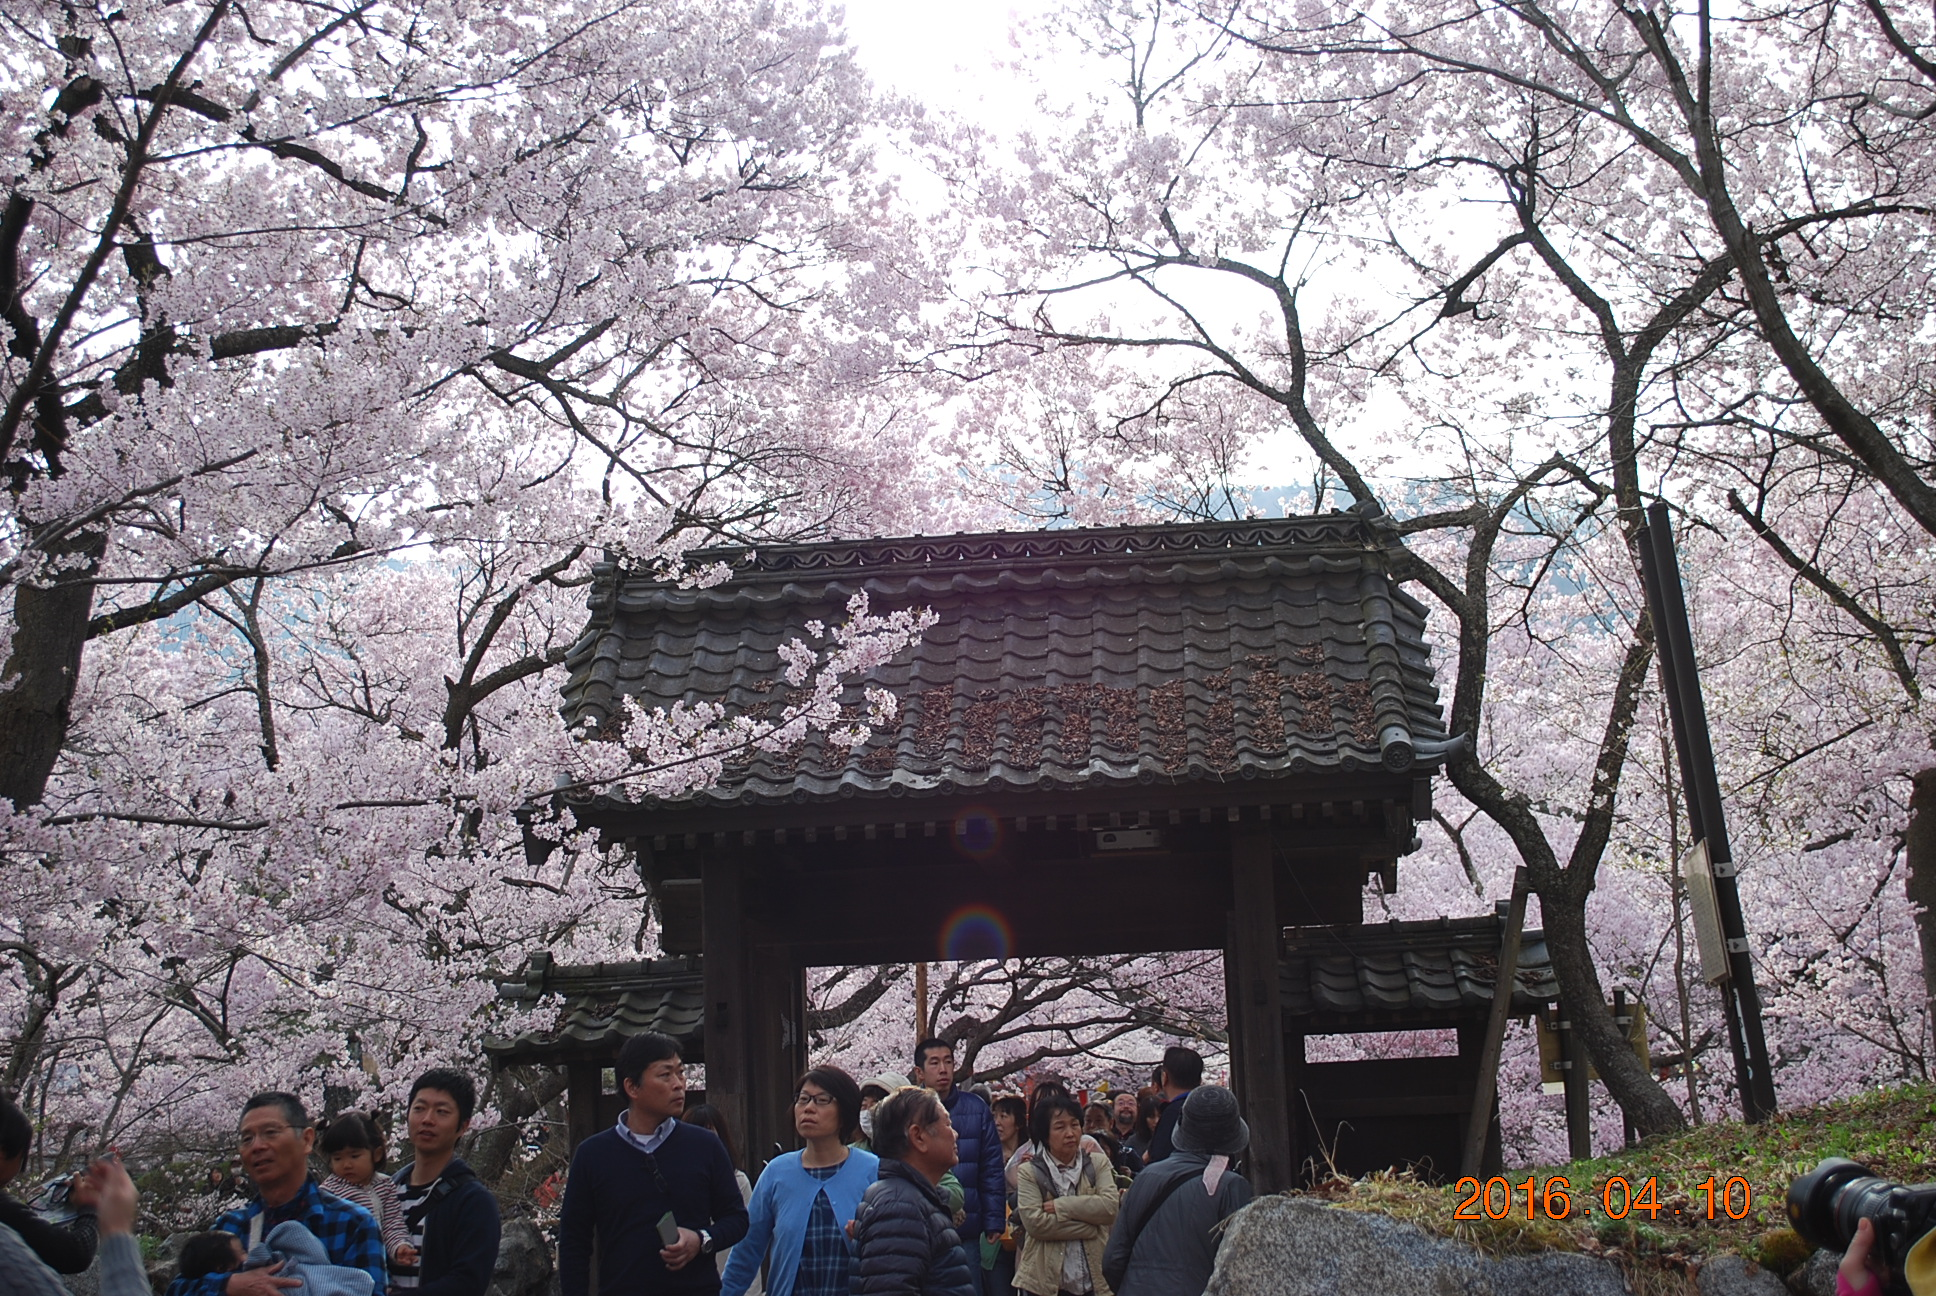 2016_0410_074129-DSC_4885.jpg